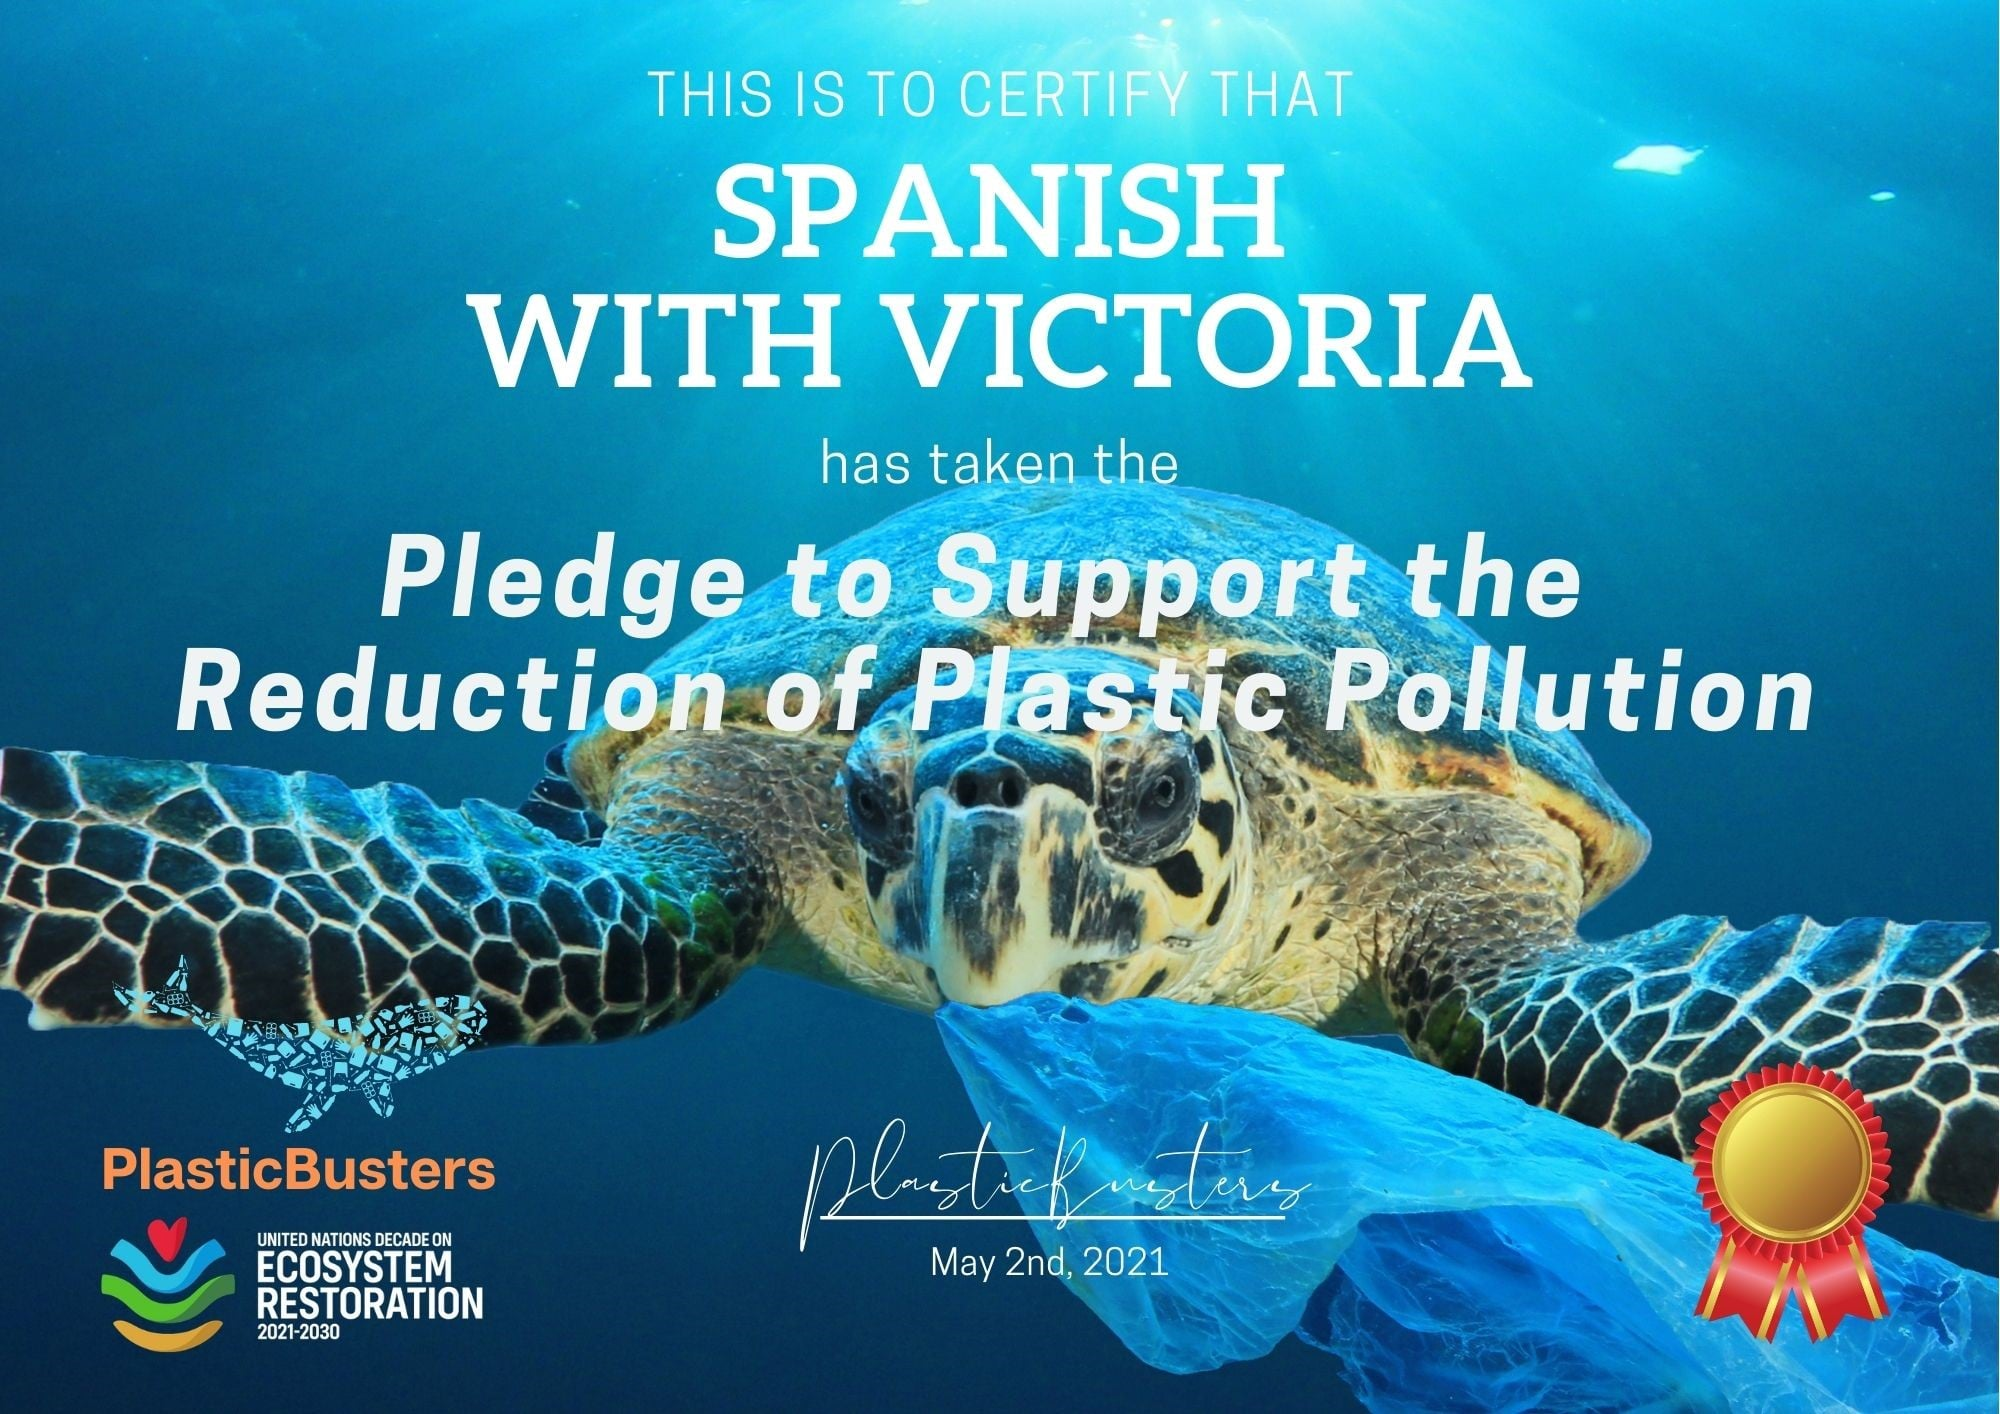 Plastic Buster Pledge